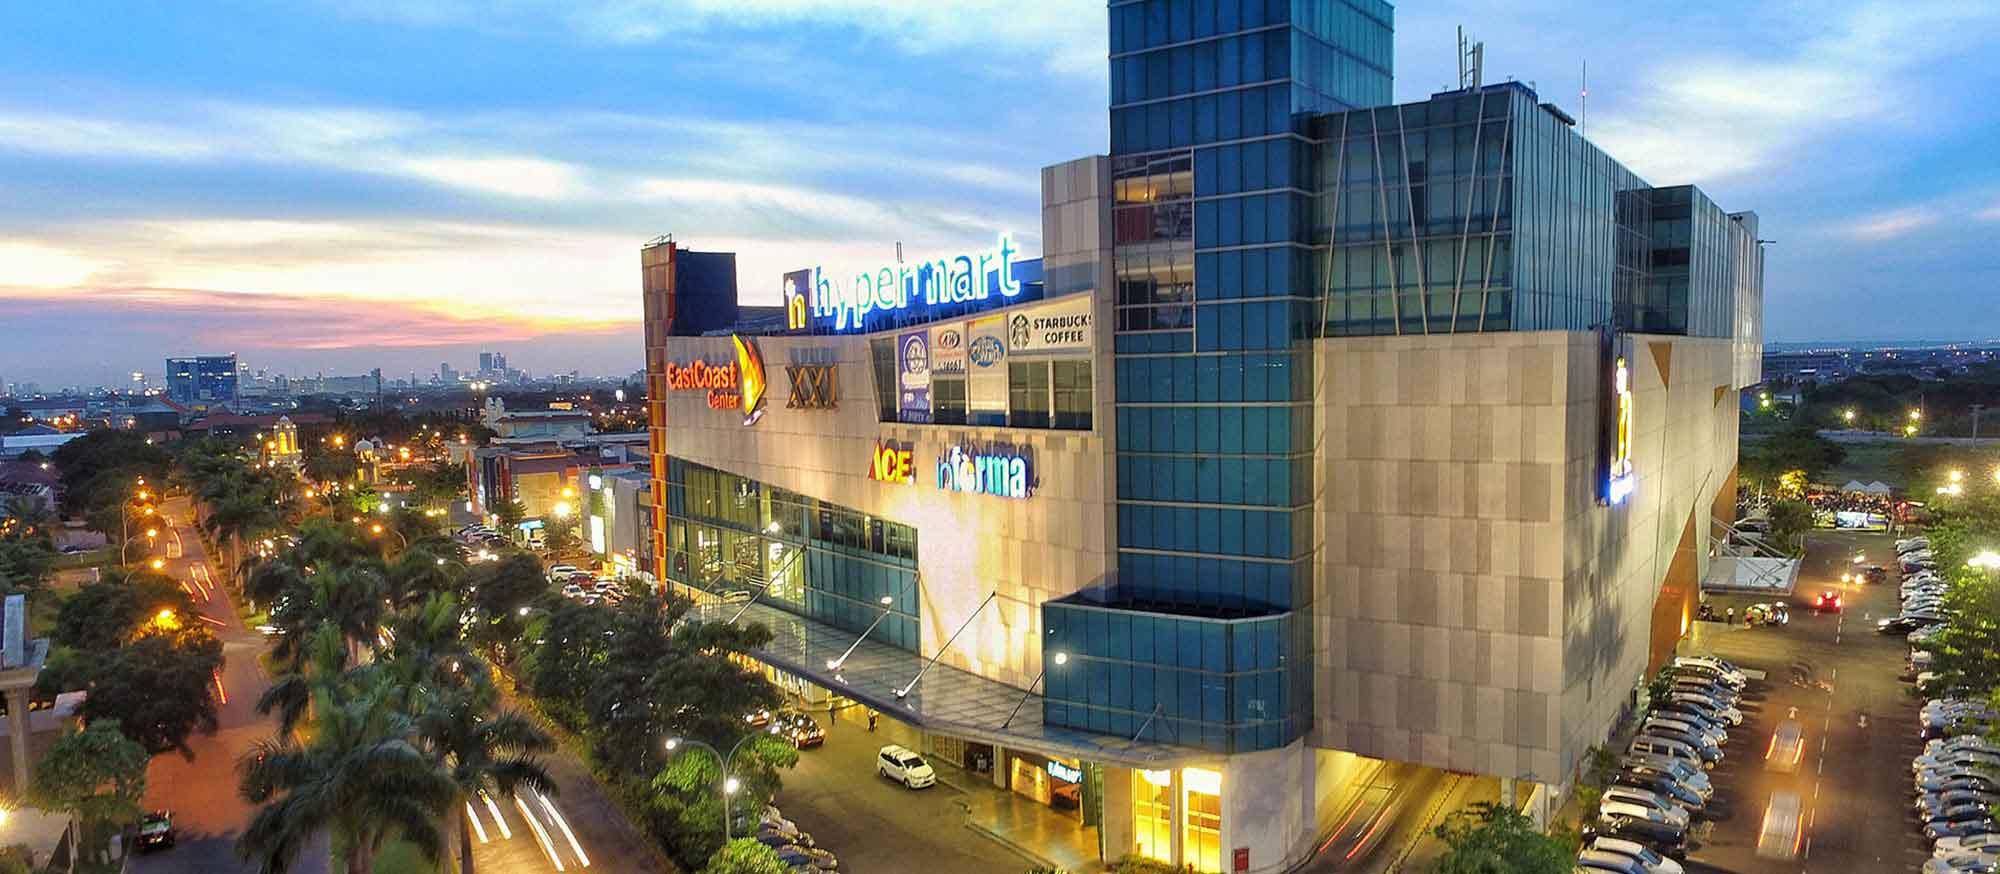 pkw-mall-com-05ecc-topbanner